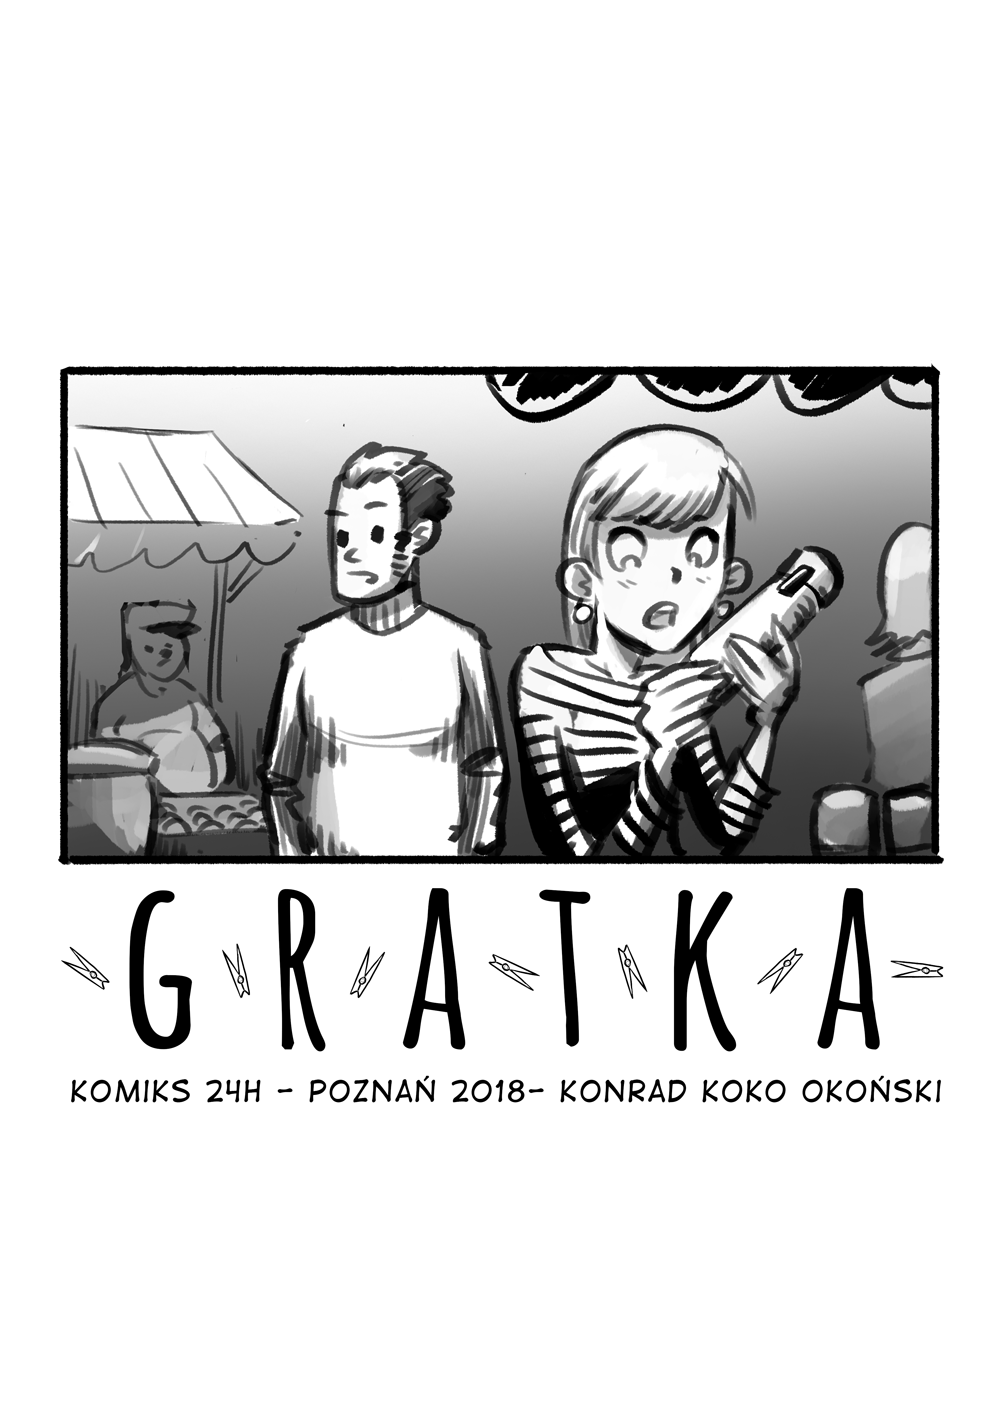 Gratka – komiks 24